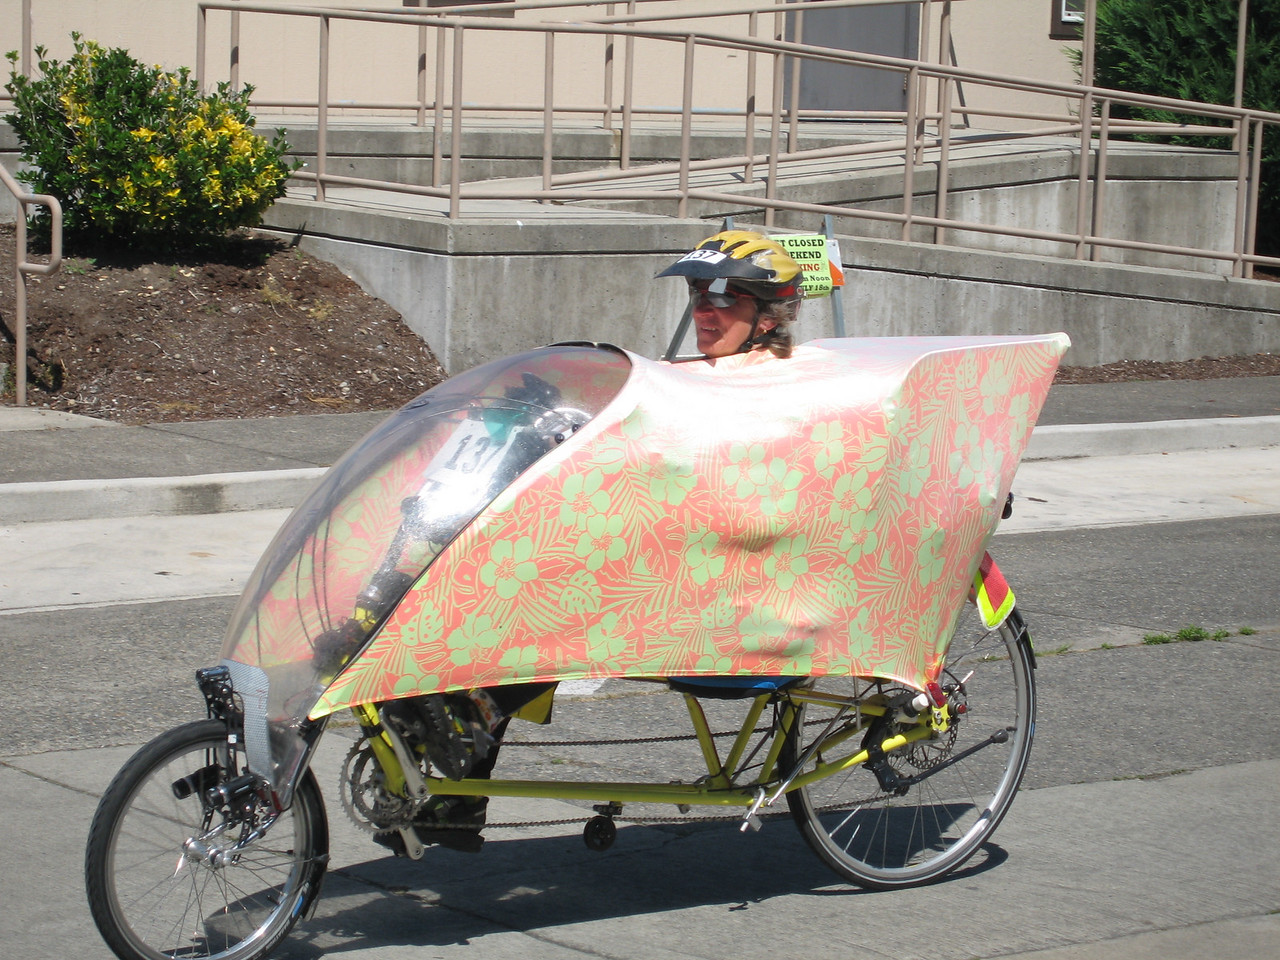 Bicycle hippie-nerdage.